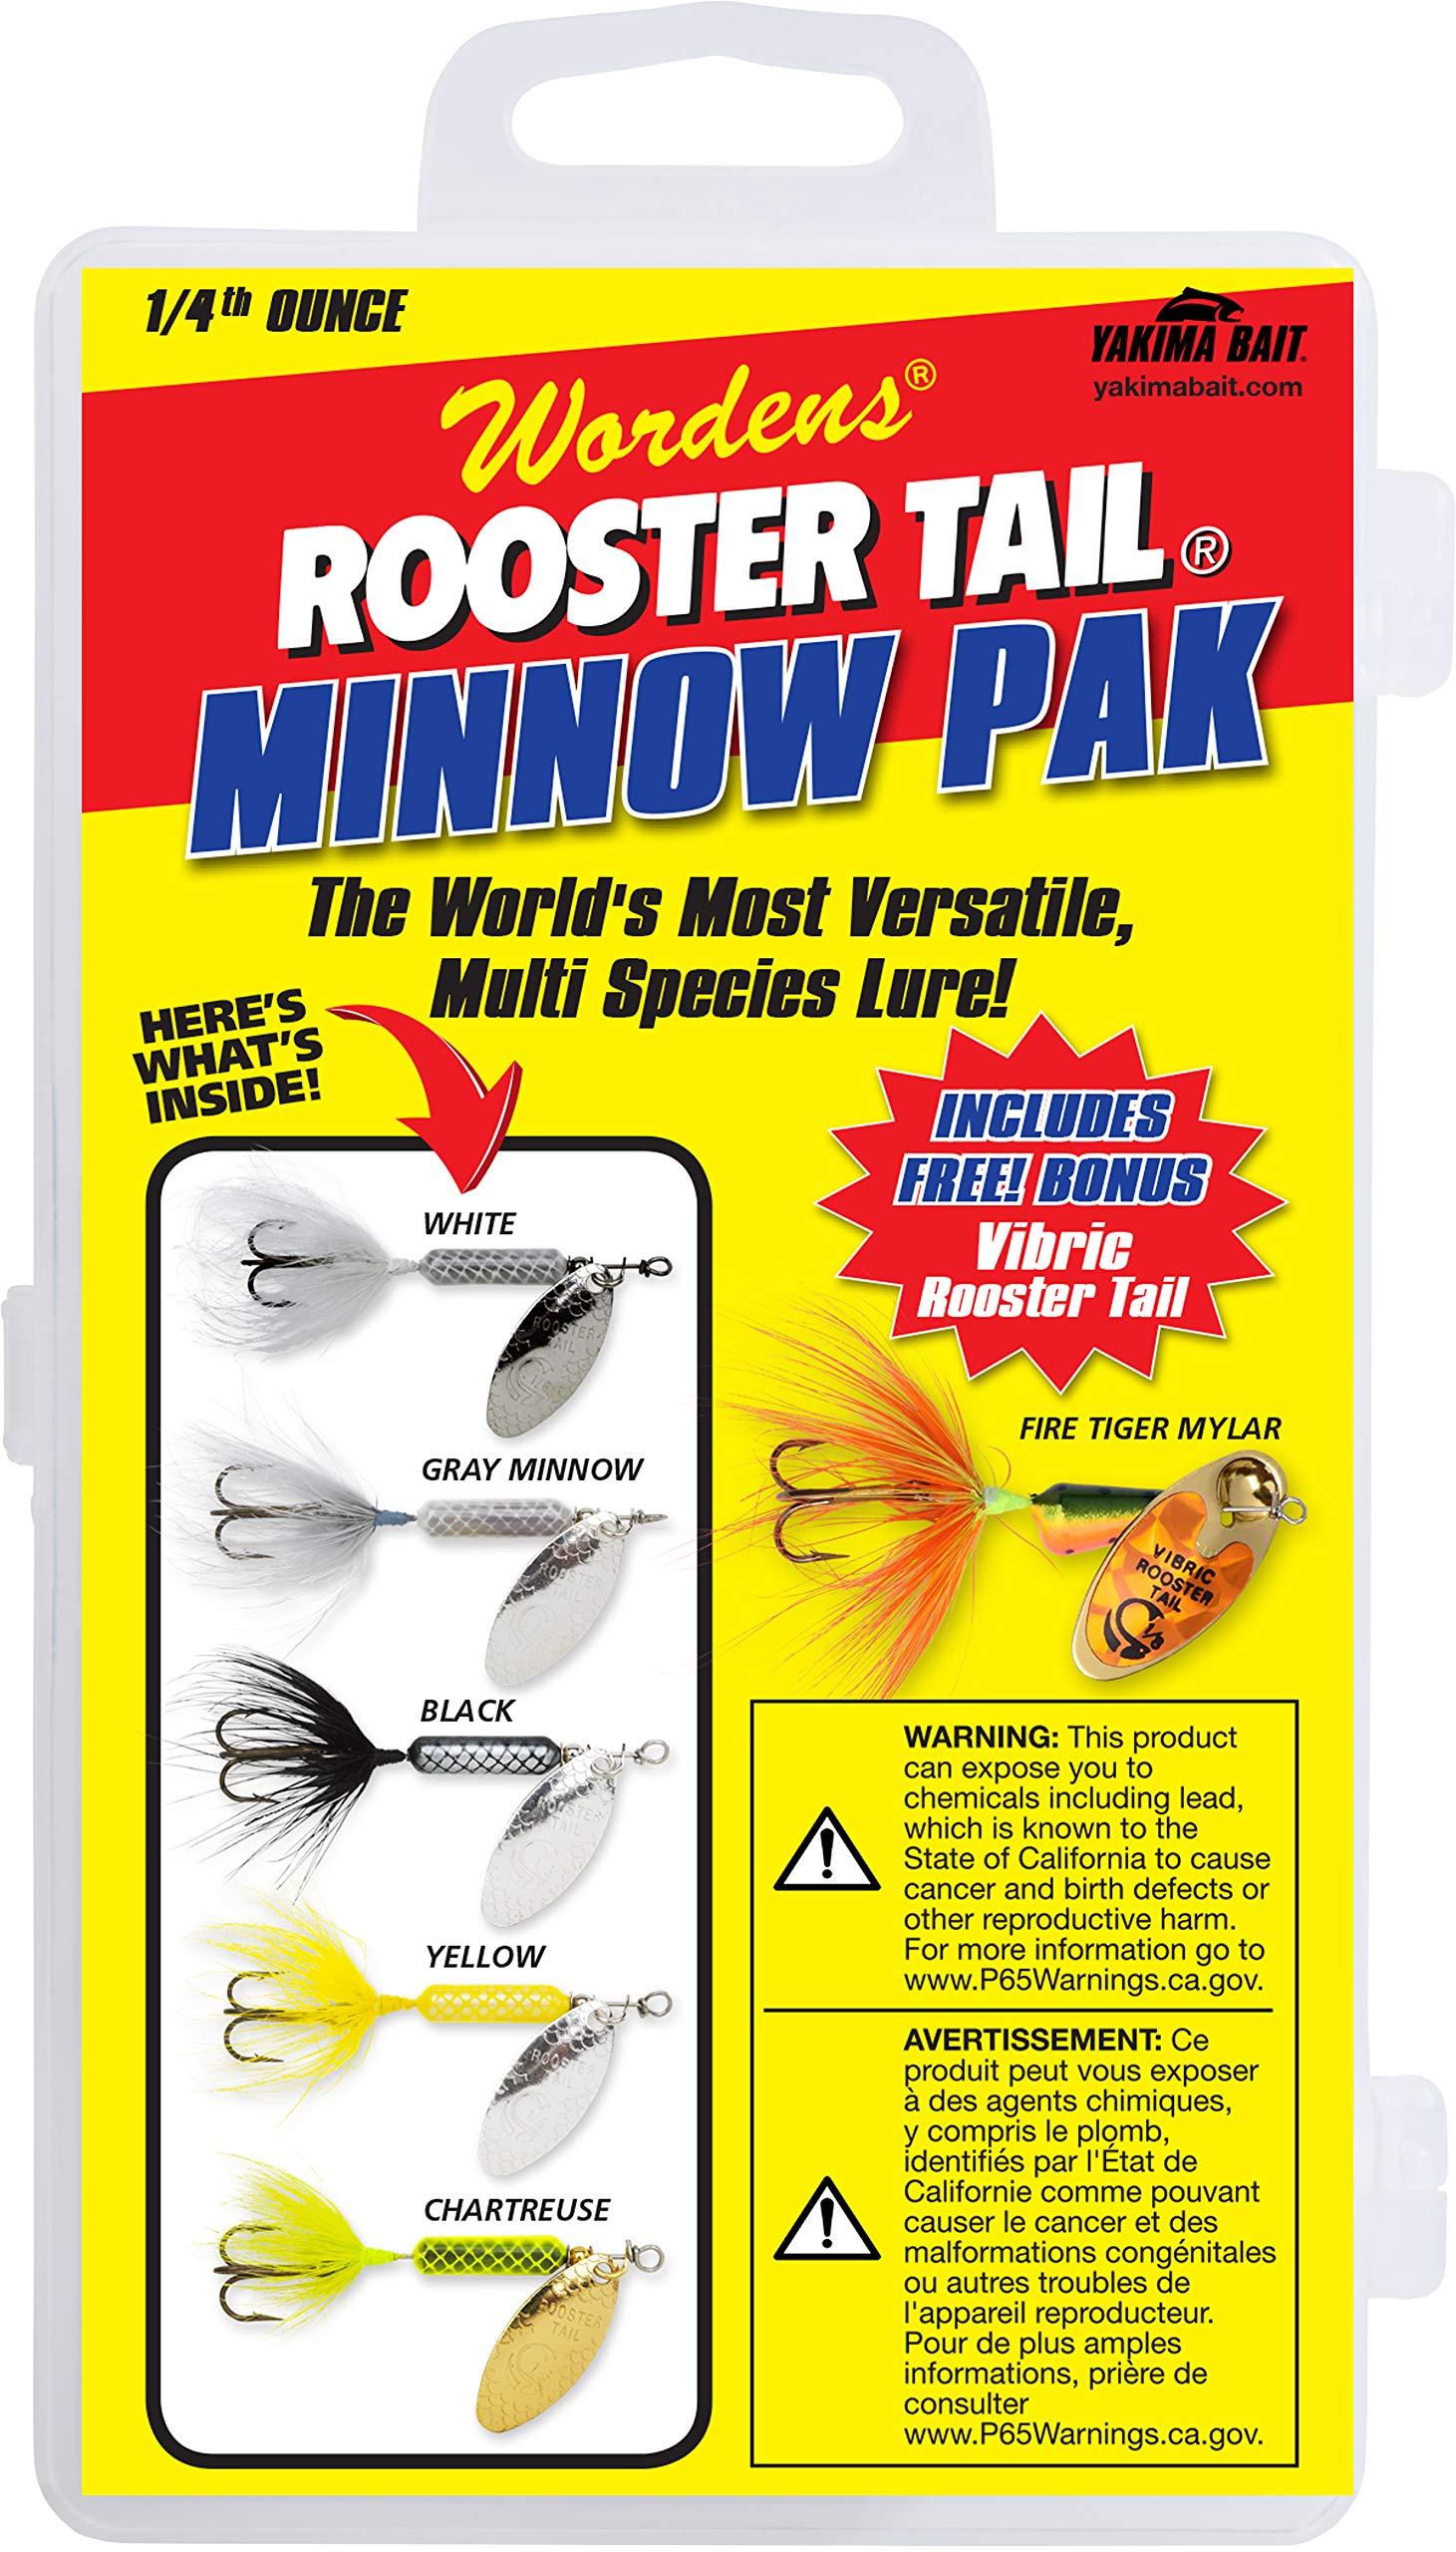 Yakima Bait Rooster Tail 1/4oz Box Kit- Minnow Pak Mix by Yakima Bait